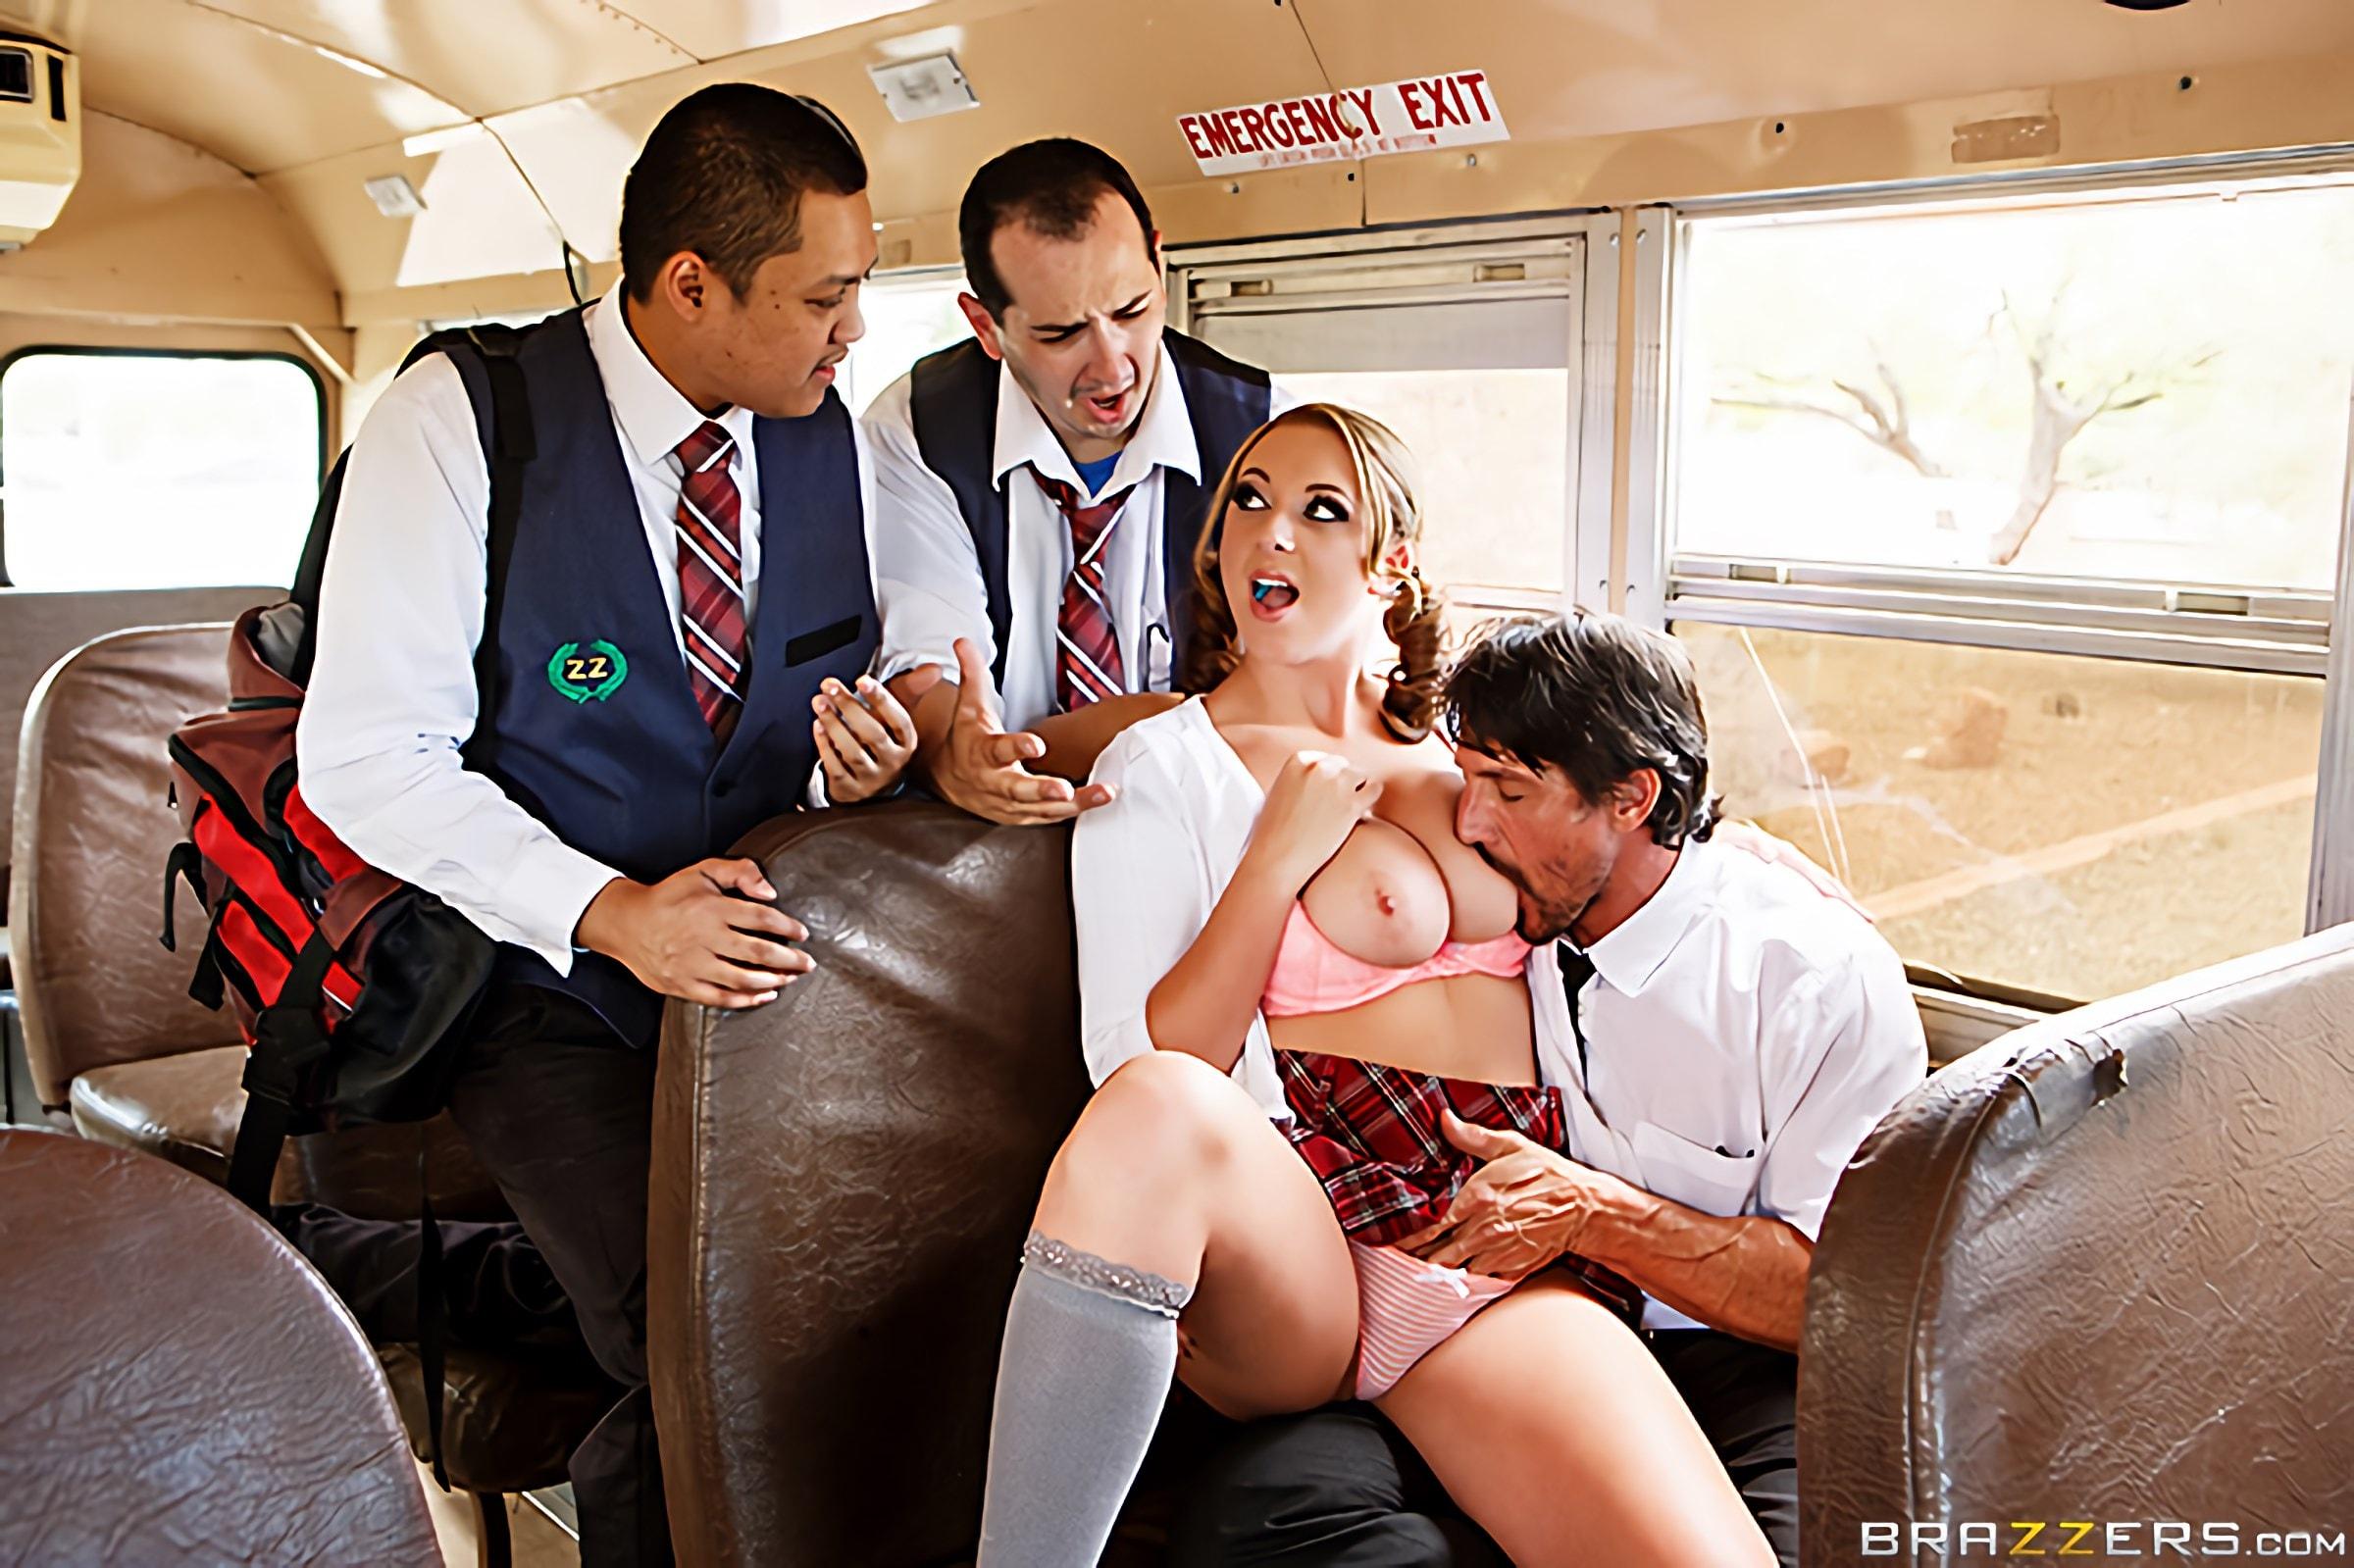 Cheerleader Orgy On The School Bus